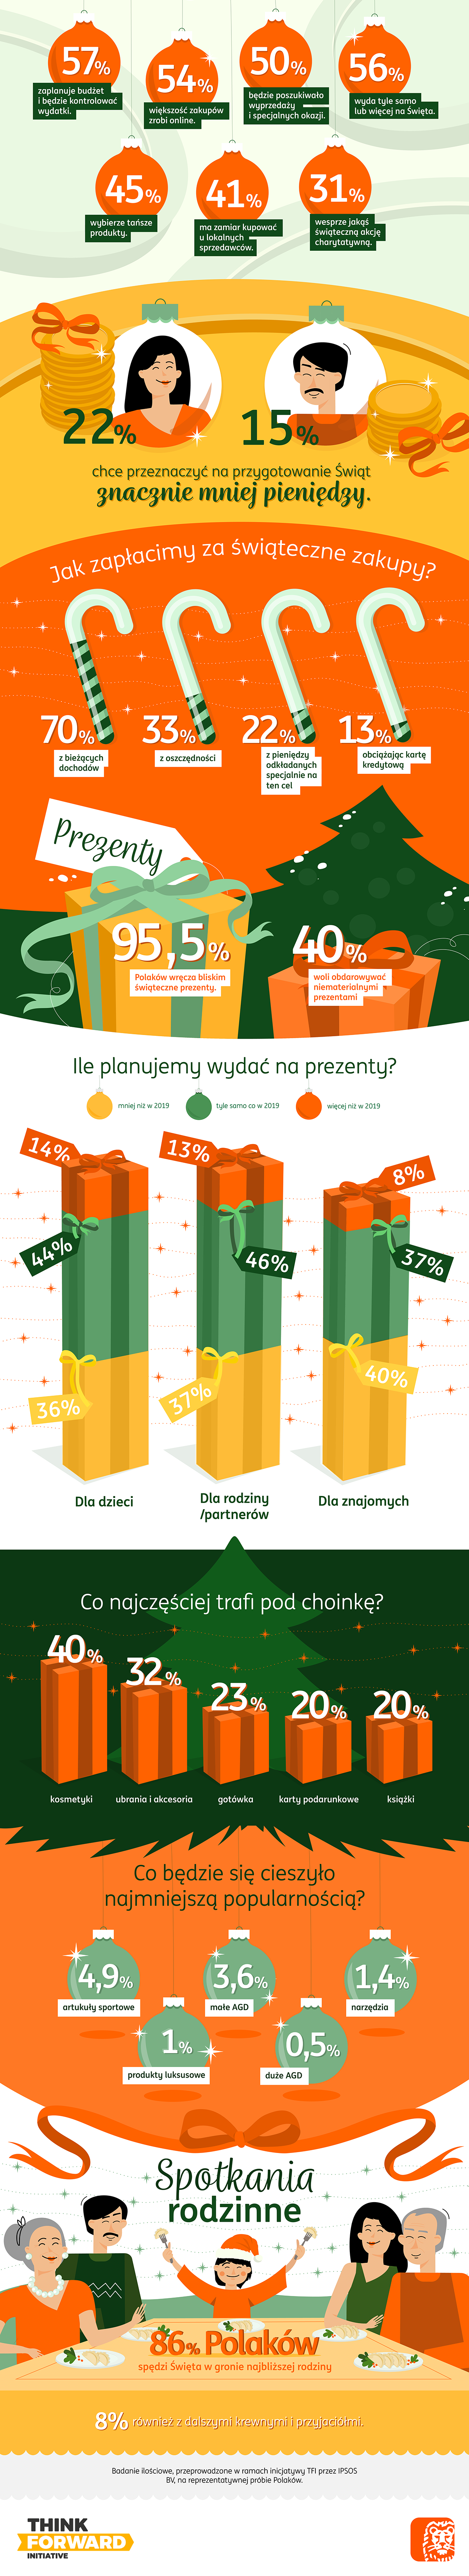 ING_infografika_swieta_2020_12_09-v04_body.png